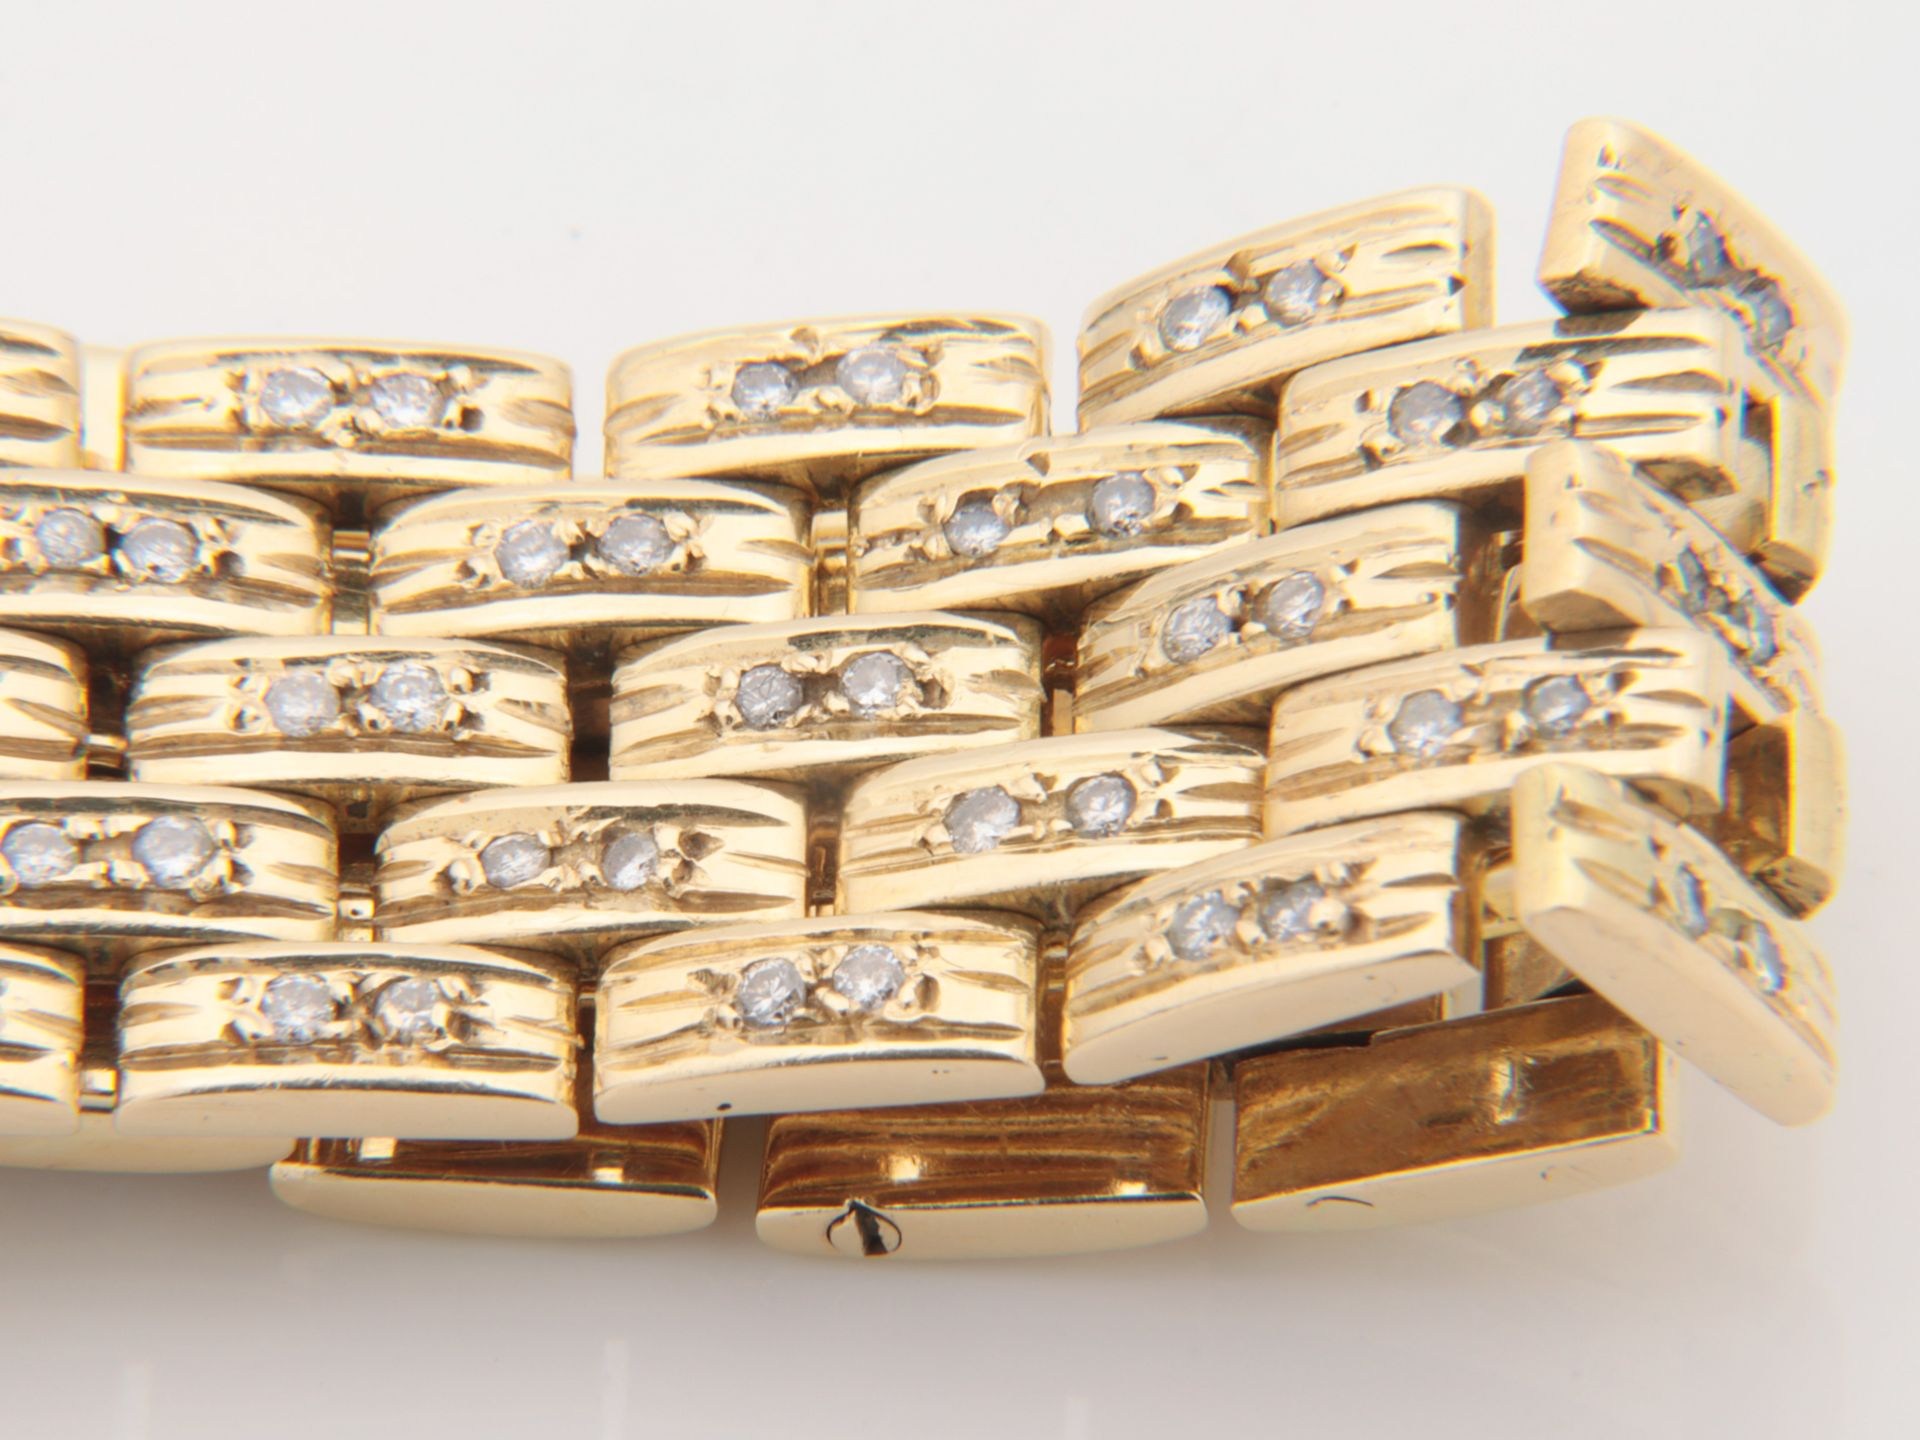 Cartier - Damenarmbanduhr - Image 4 of 14